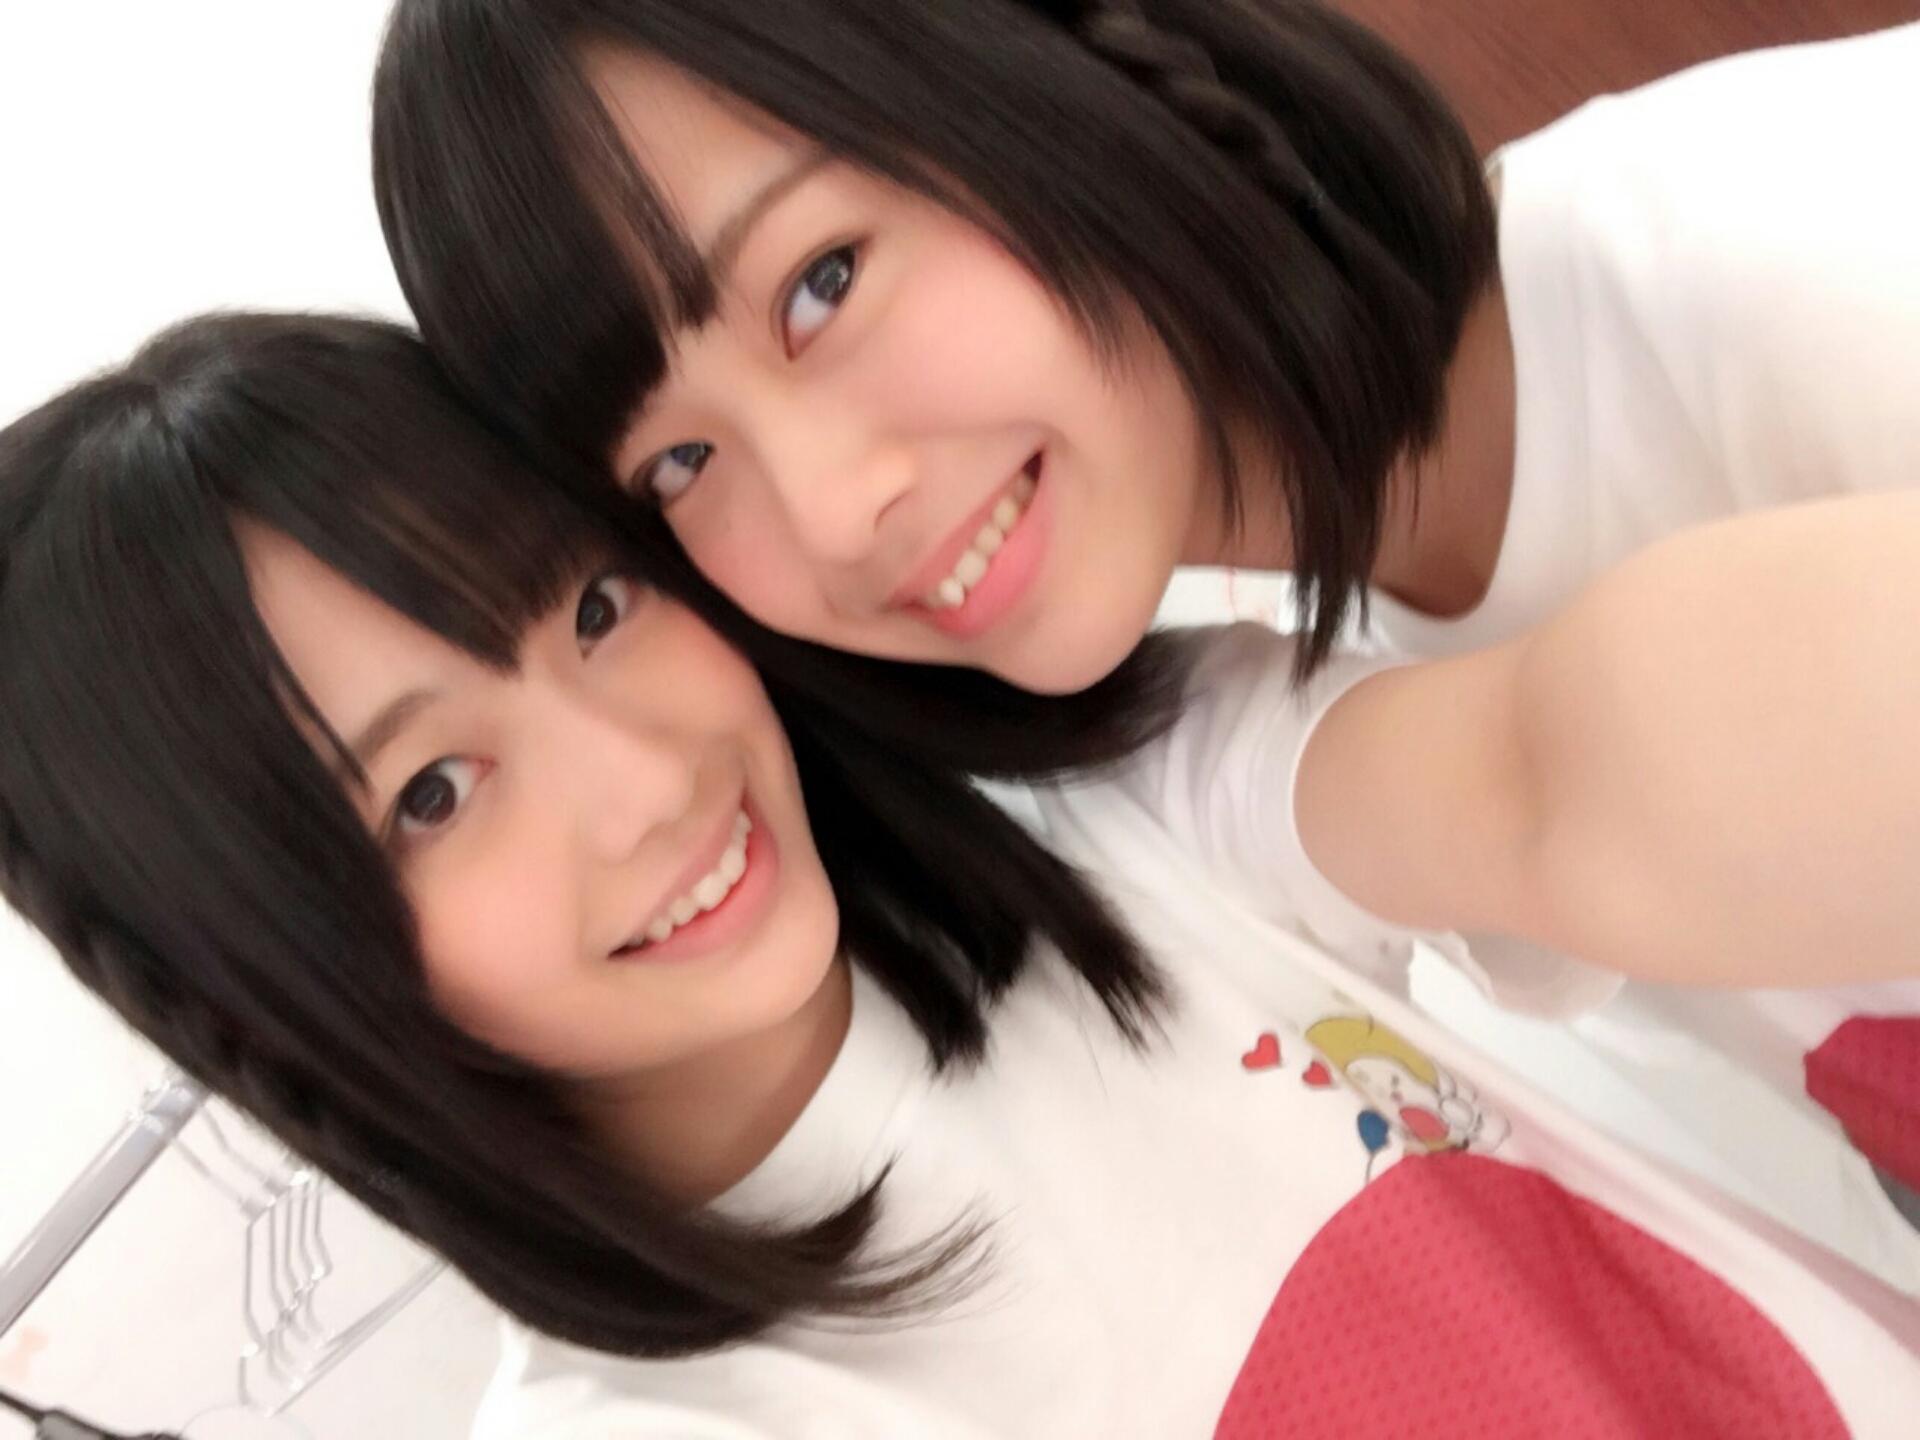 【AKB48】早坂つむぎ応援スレ★19【チーム8山形県代表】 YouTube動画>22本 ->画像>185枚